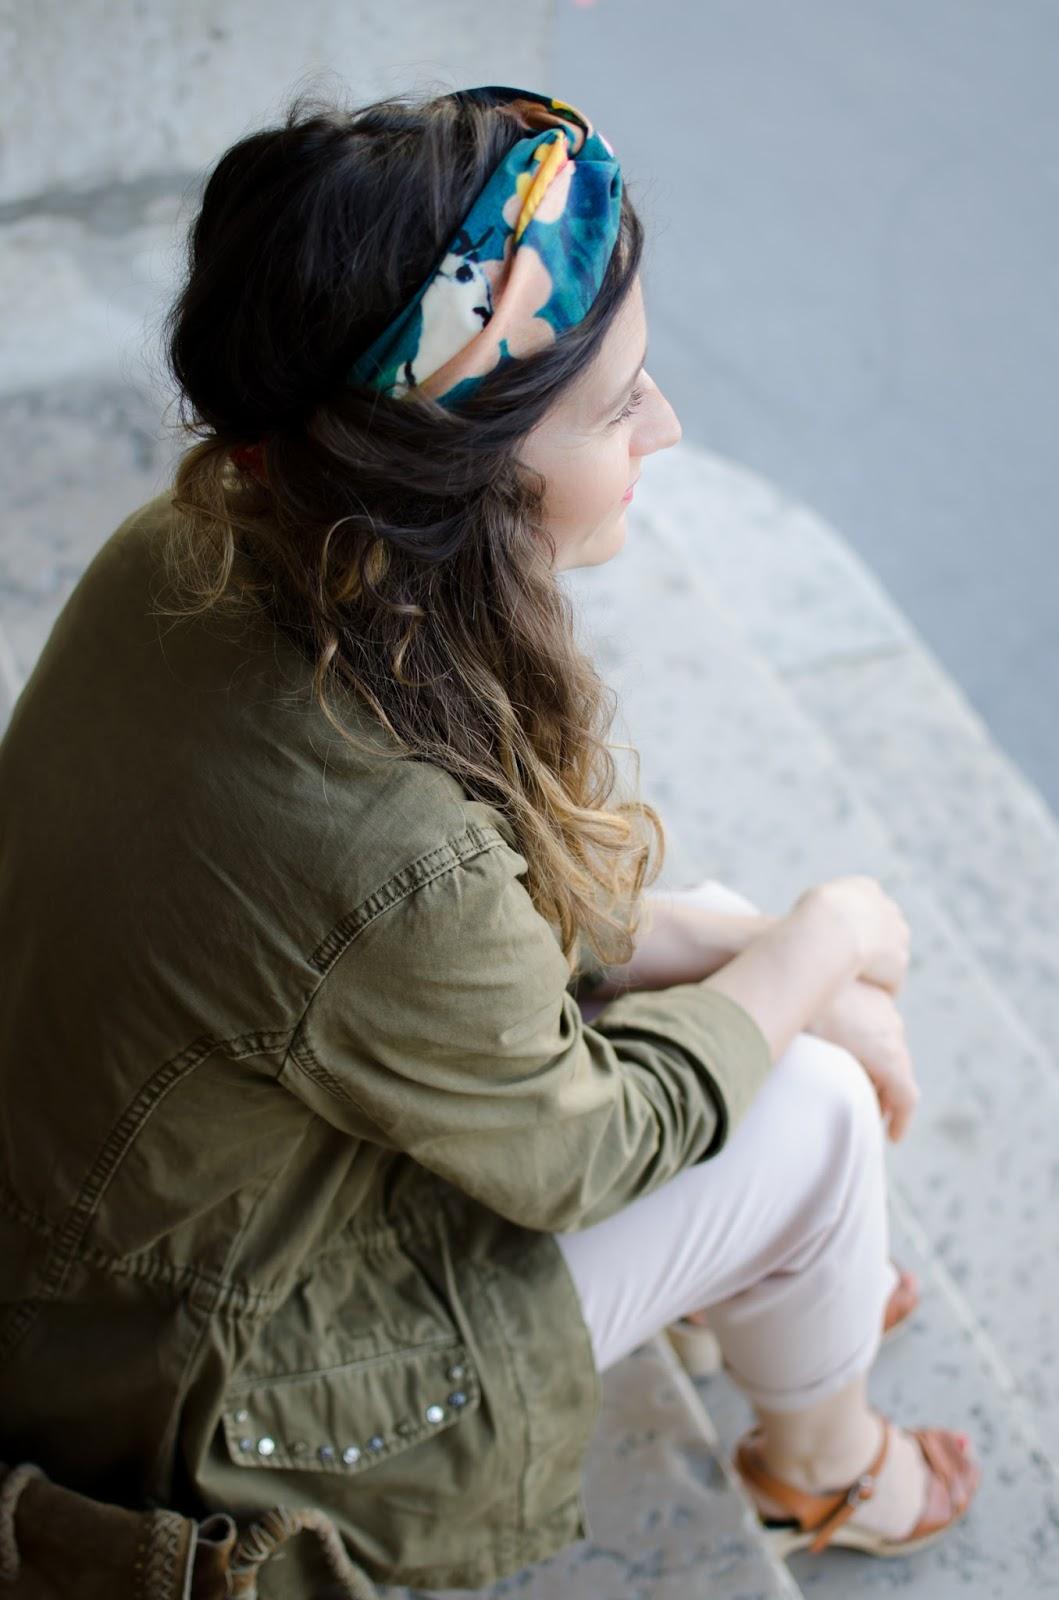 Comment porter un headband